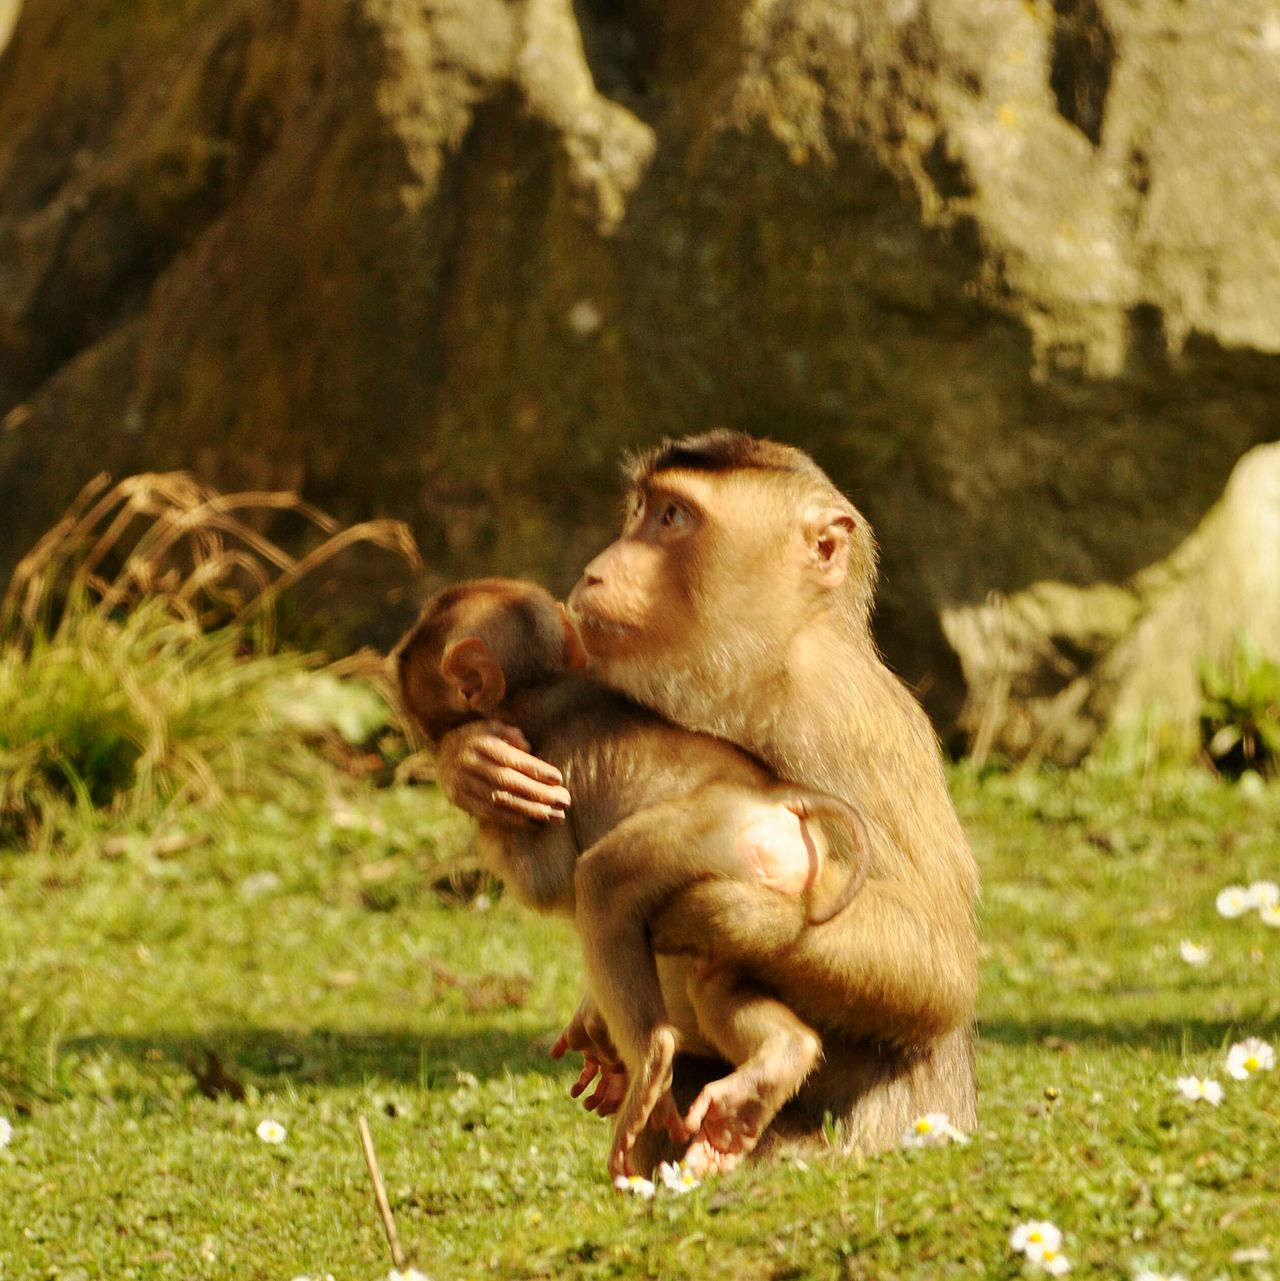 Affen Monkeys Animal_collection Animalphotography Animal Photography Animal Themes Zoology Zoo Animals  Zoo Animals In The Wild Wildlife Photography ZOOM Erlebniswelt Wildlife